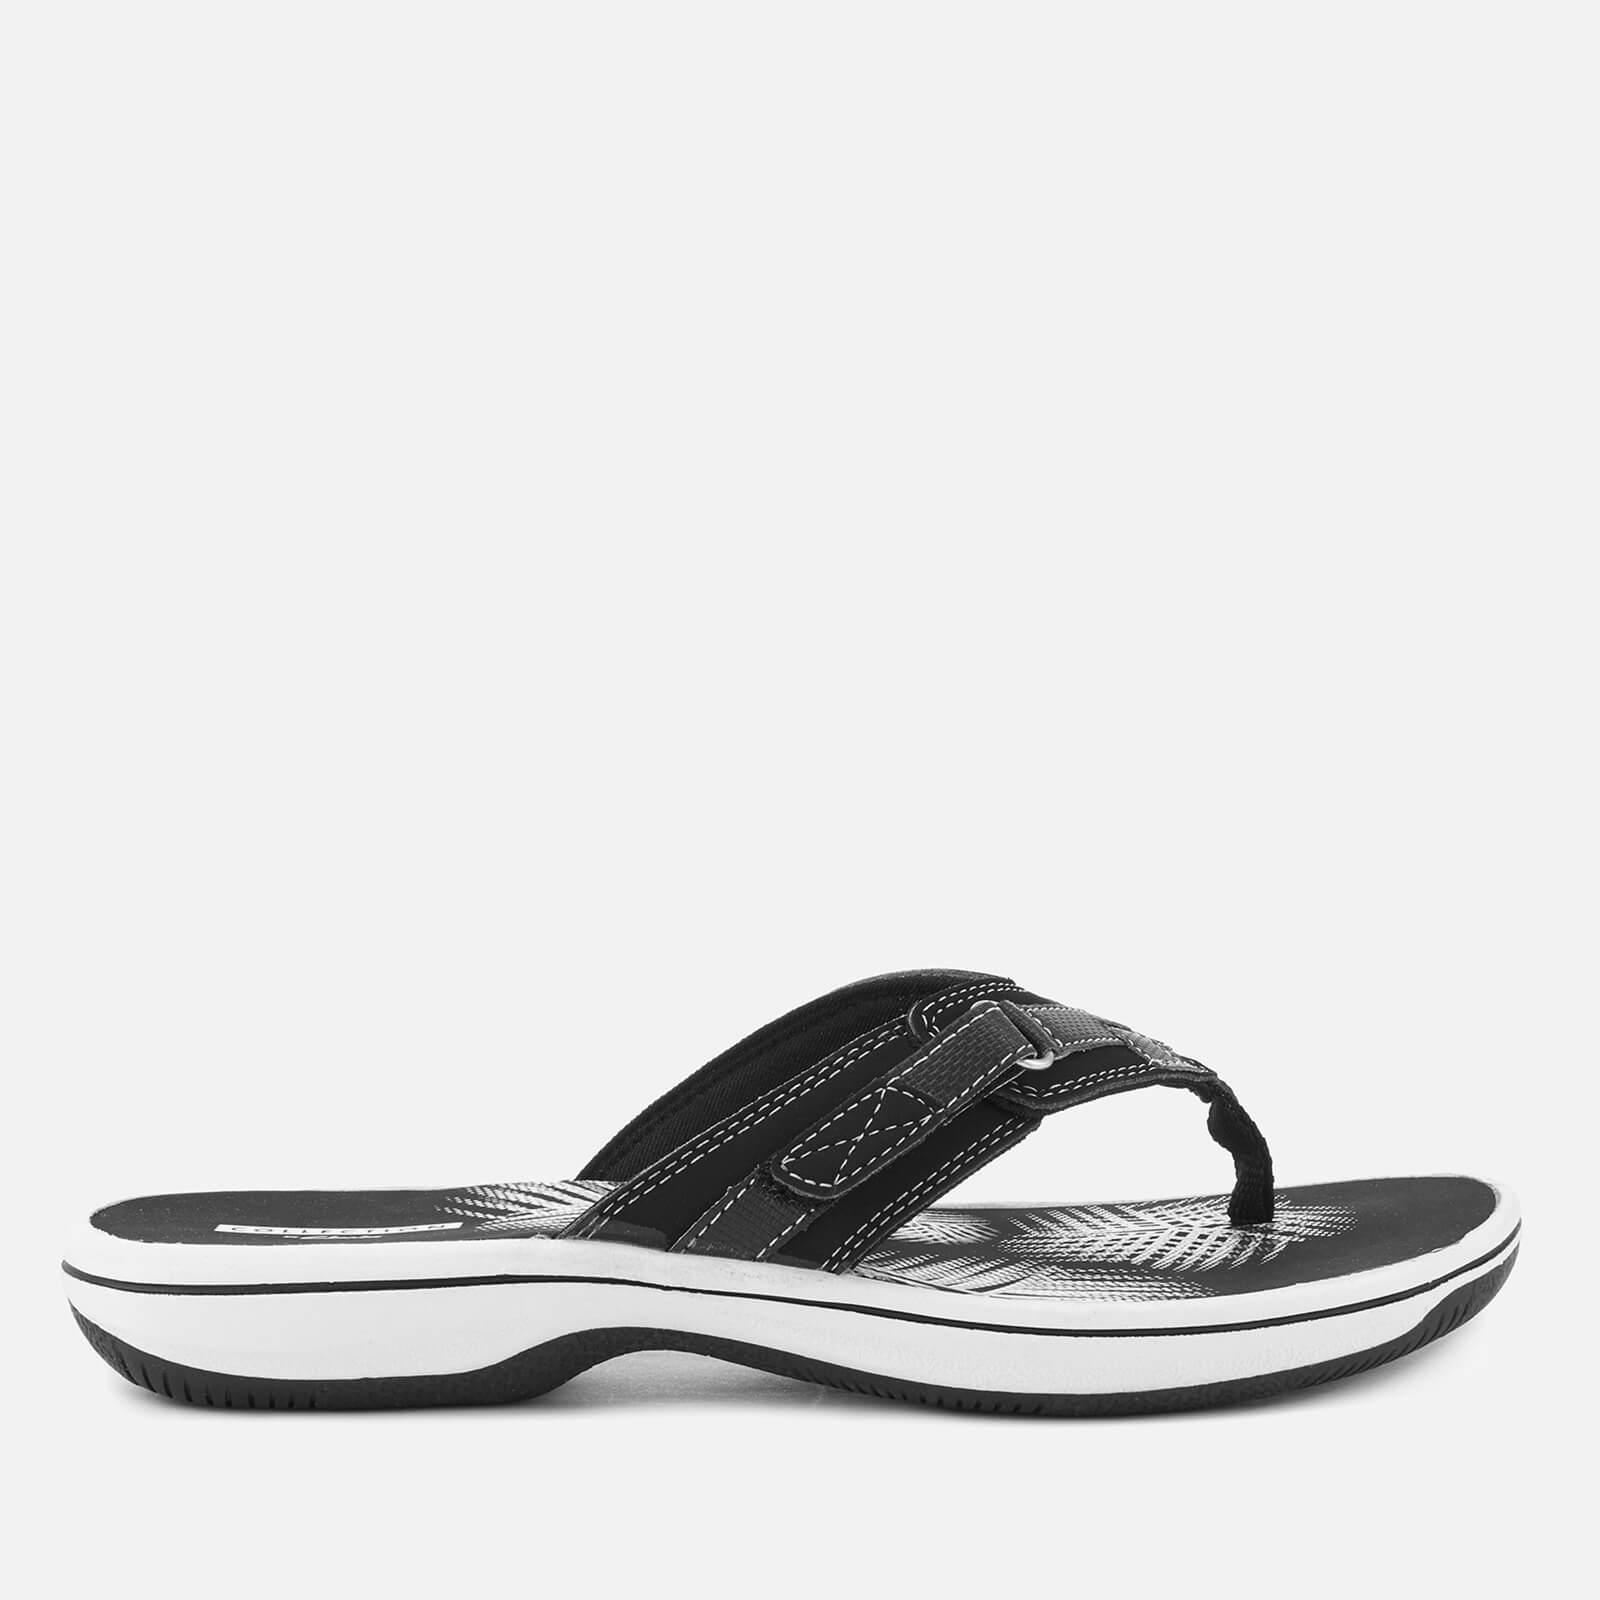 outlet boutique catch official images Clarks Women's Brinkley Sea Toe Post Sandals - Black